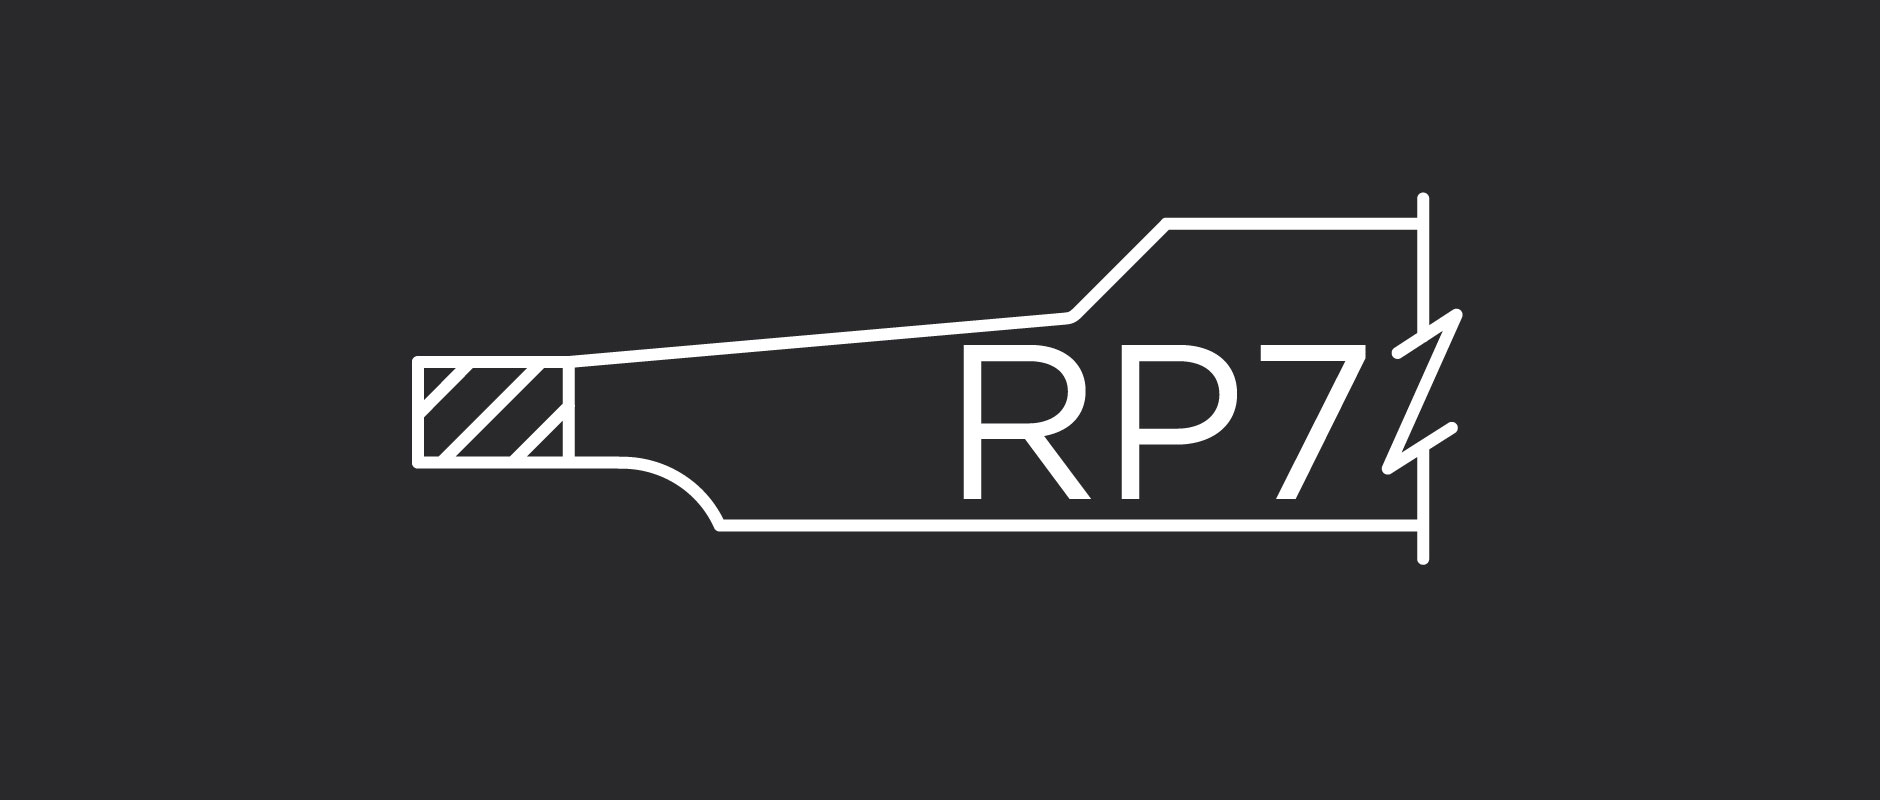 RP7 raised panel profile